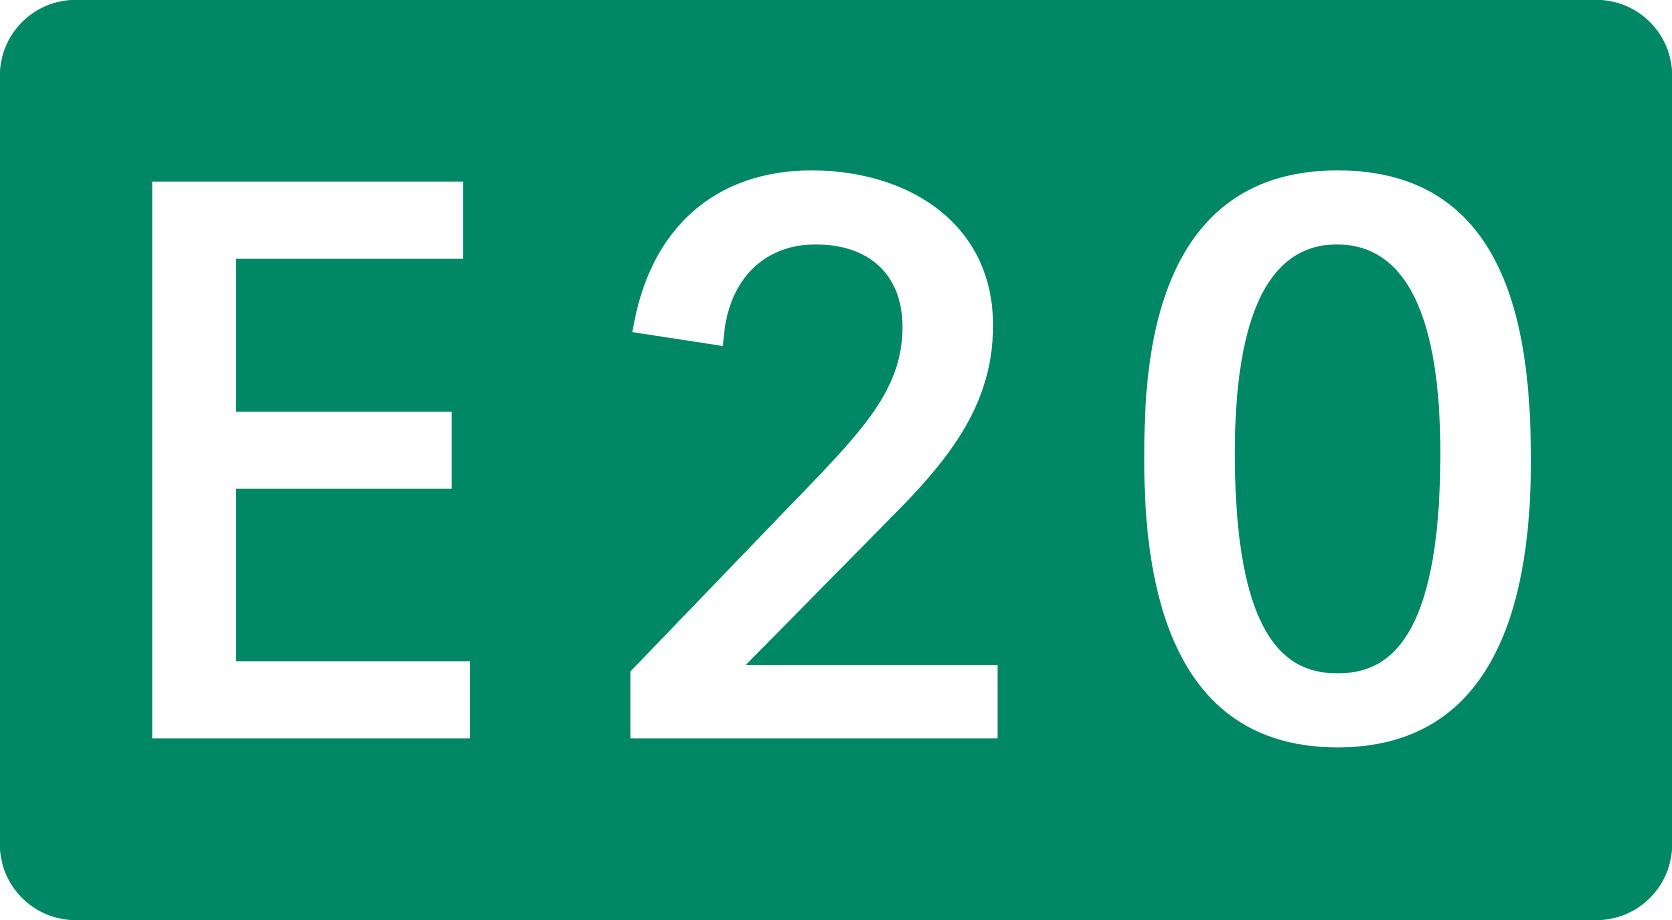 Japans Expressway Numbering System